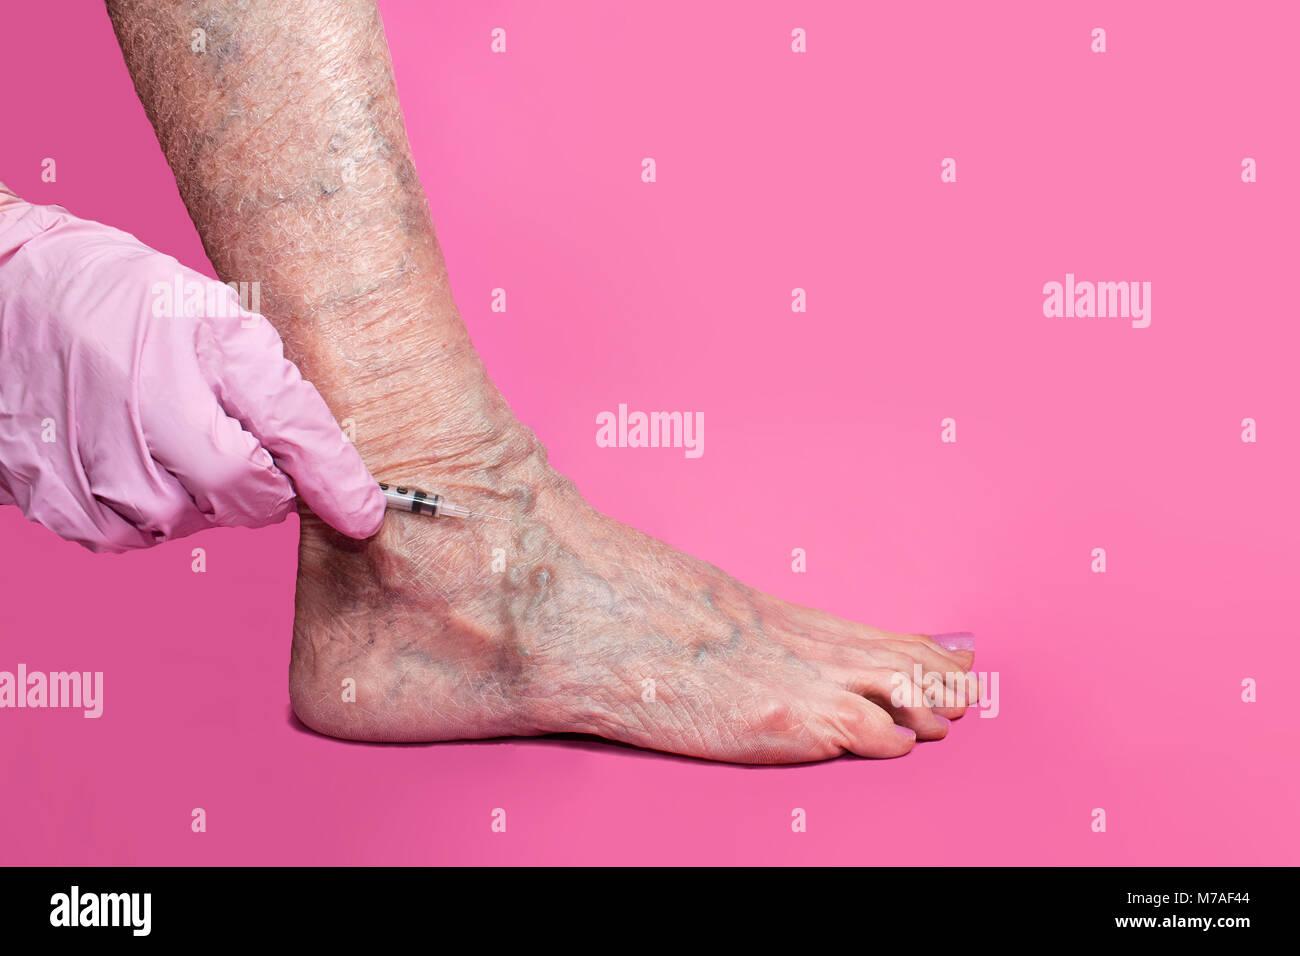 Treatment of varicose veins - Stock Image